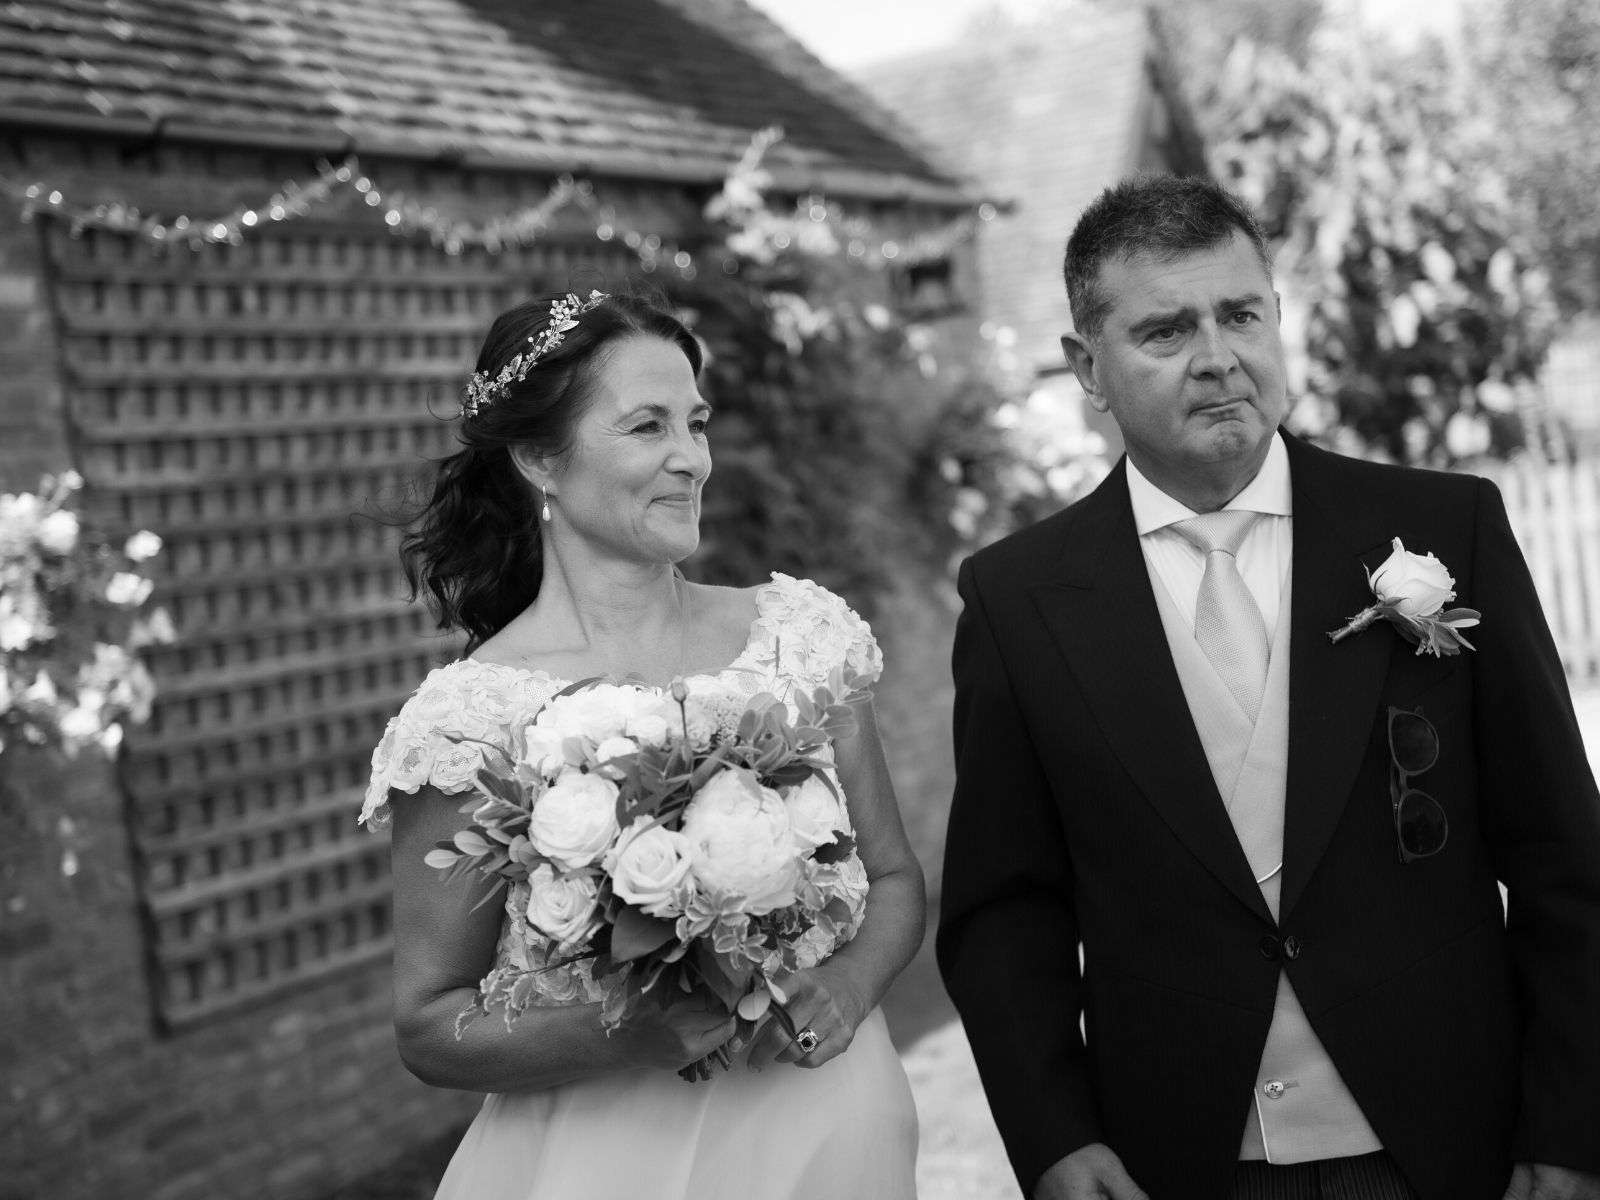 Boho Bride Jacqui on her wedding day in Warwickshire